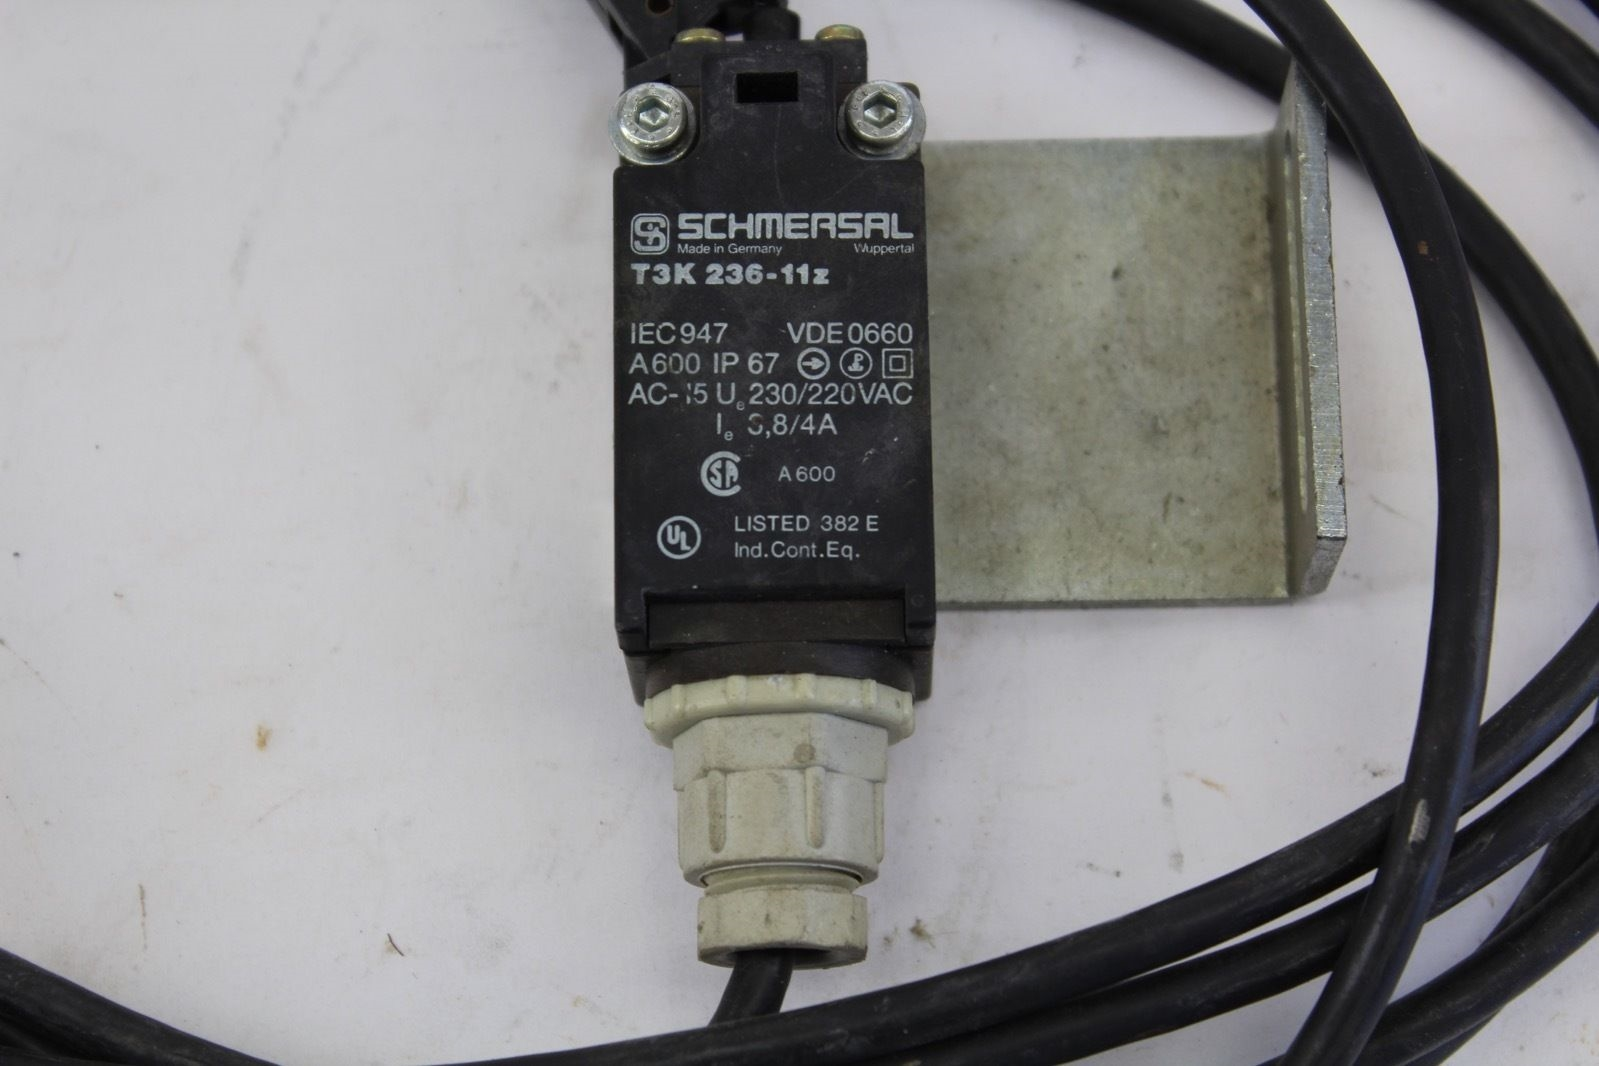 Schmersal T3K236-11z Safety Switch *NEW* (B232) 2